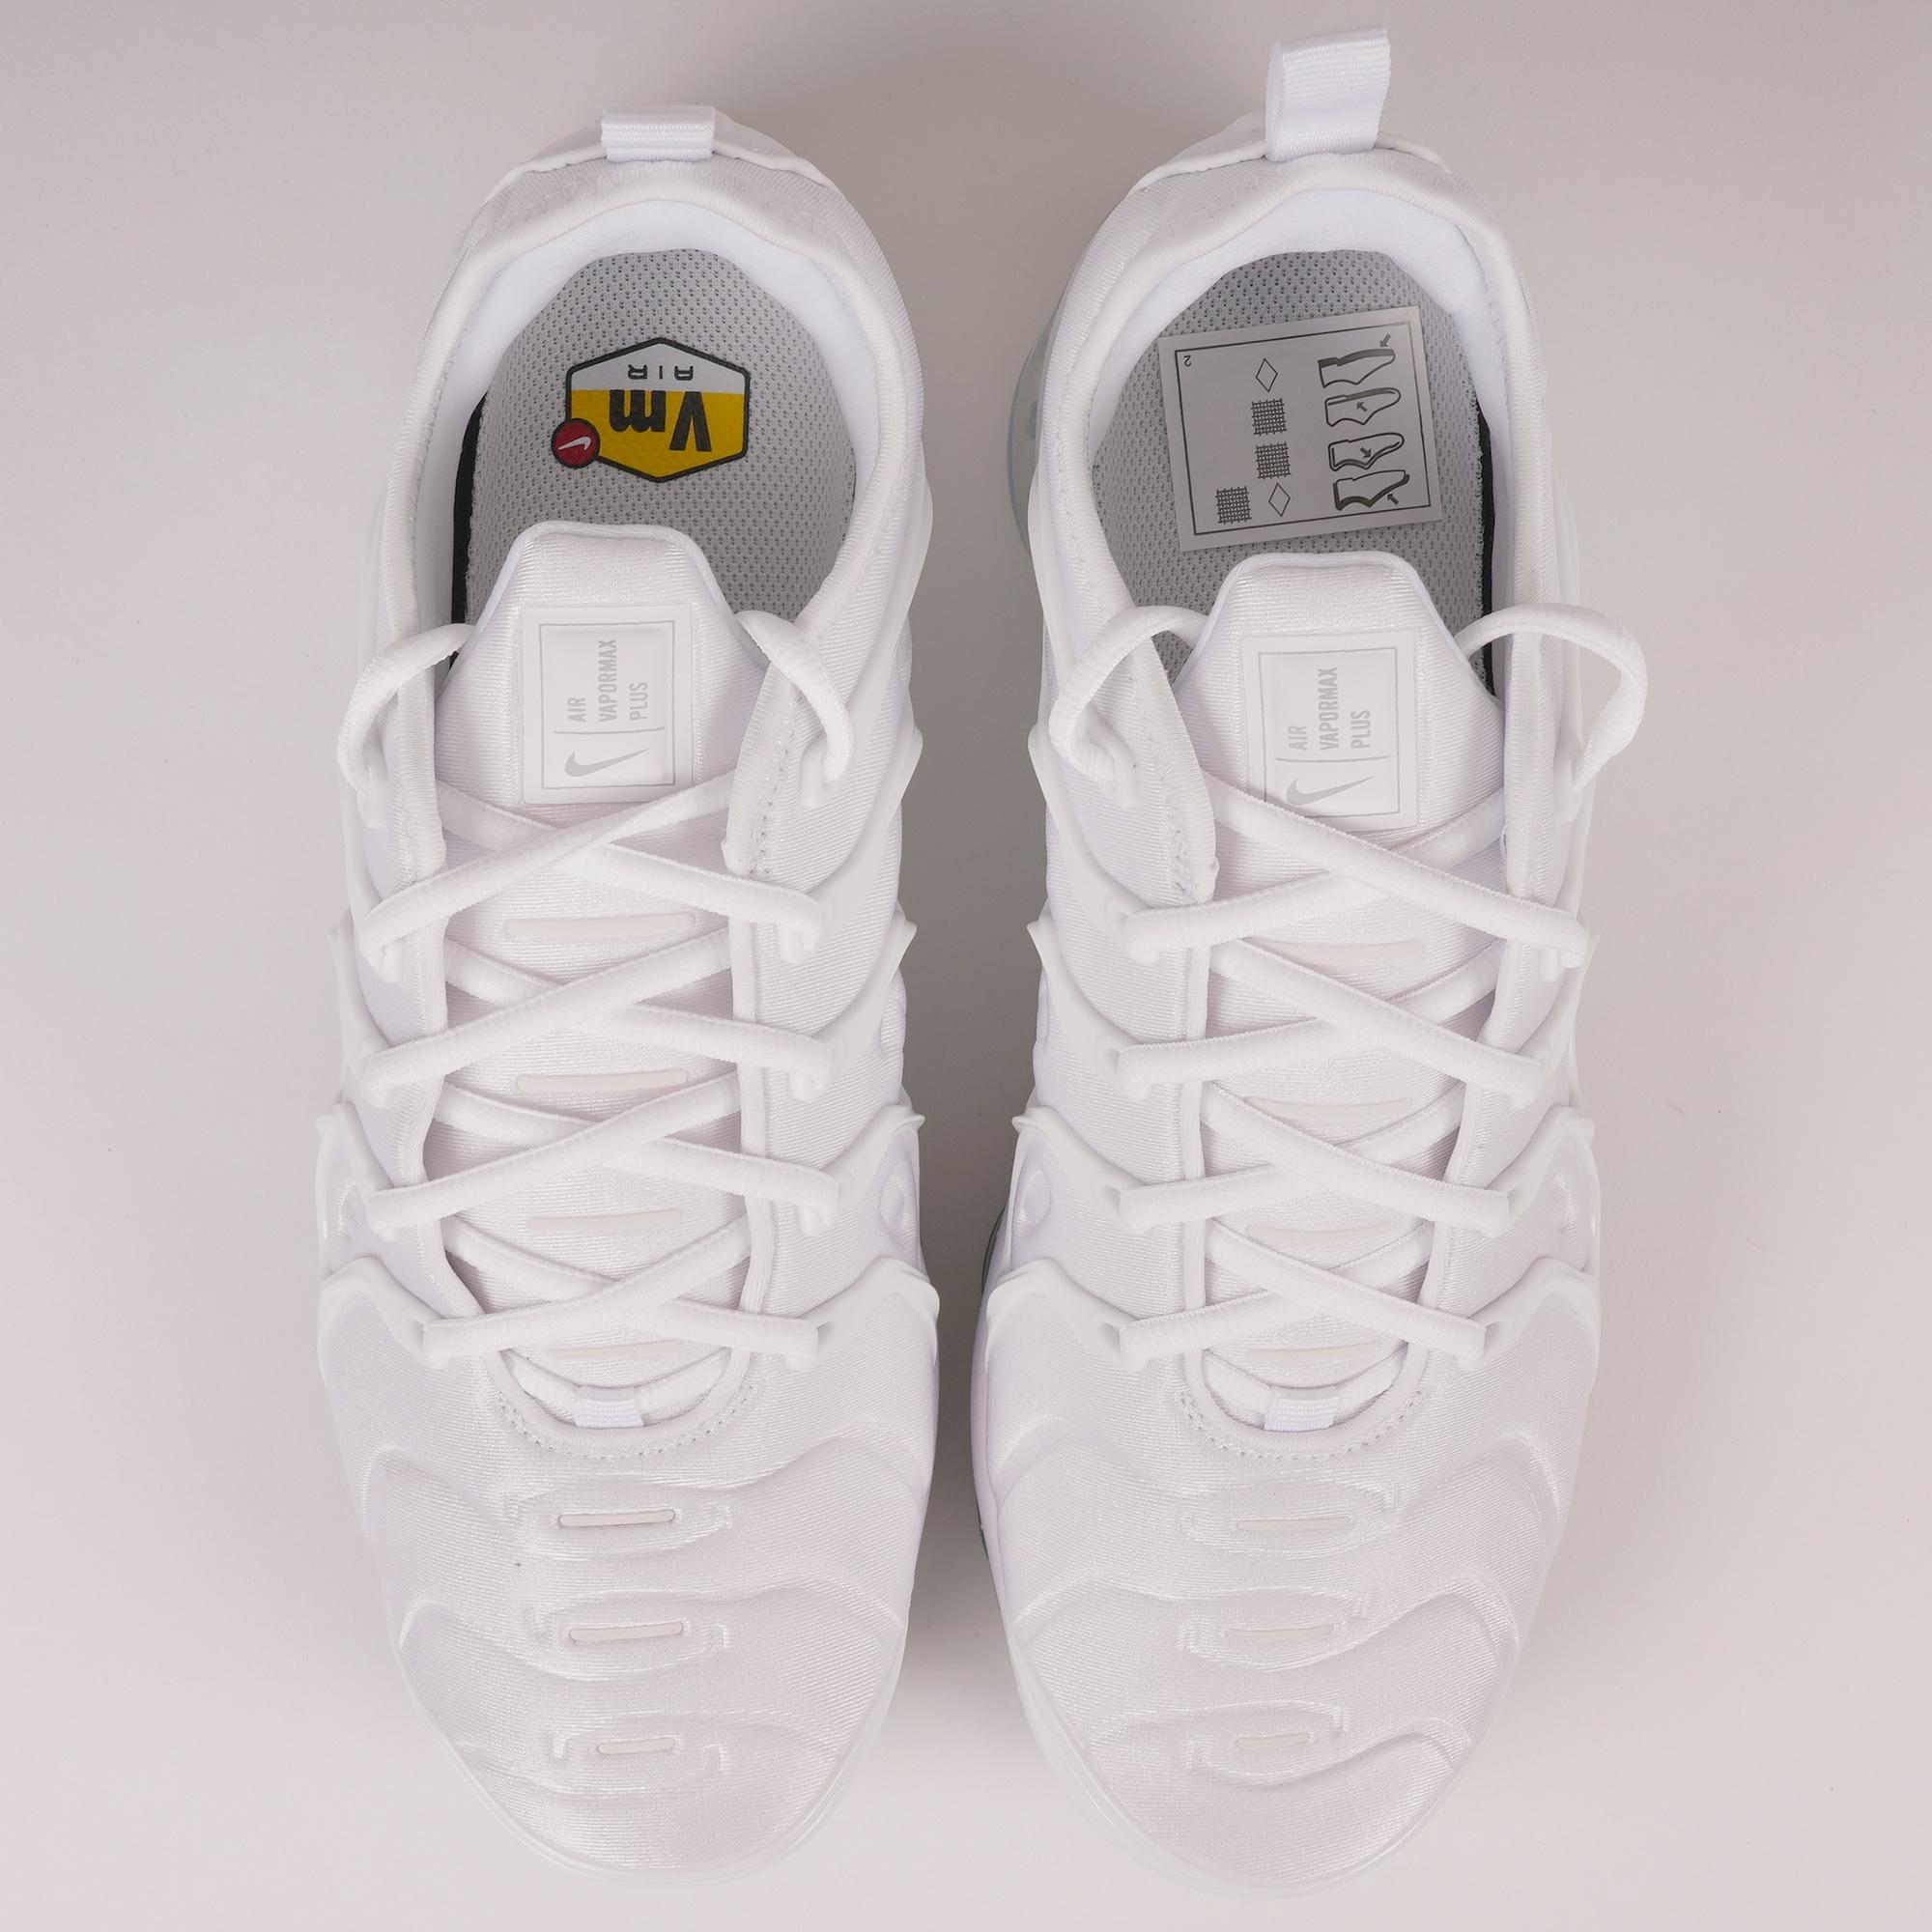 92b27326bed2 Nike Air VaporMax Plus (White   Pure Platinum) at Dandy Fellow